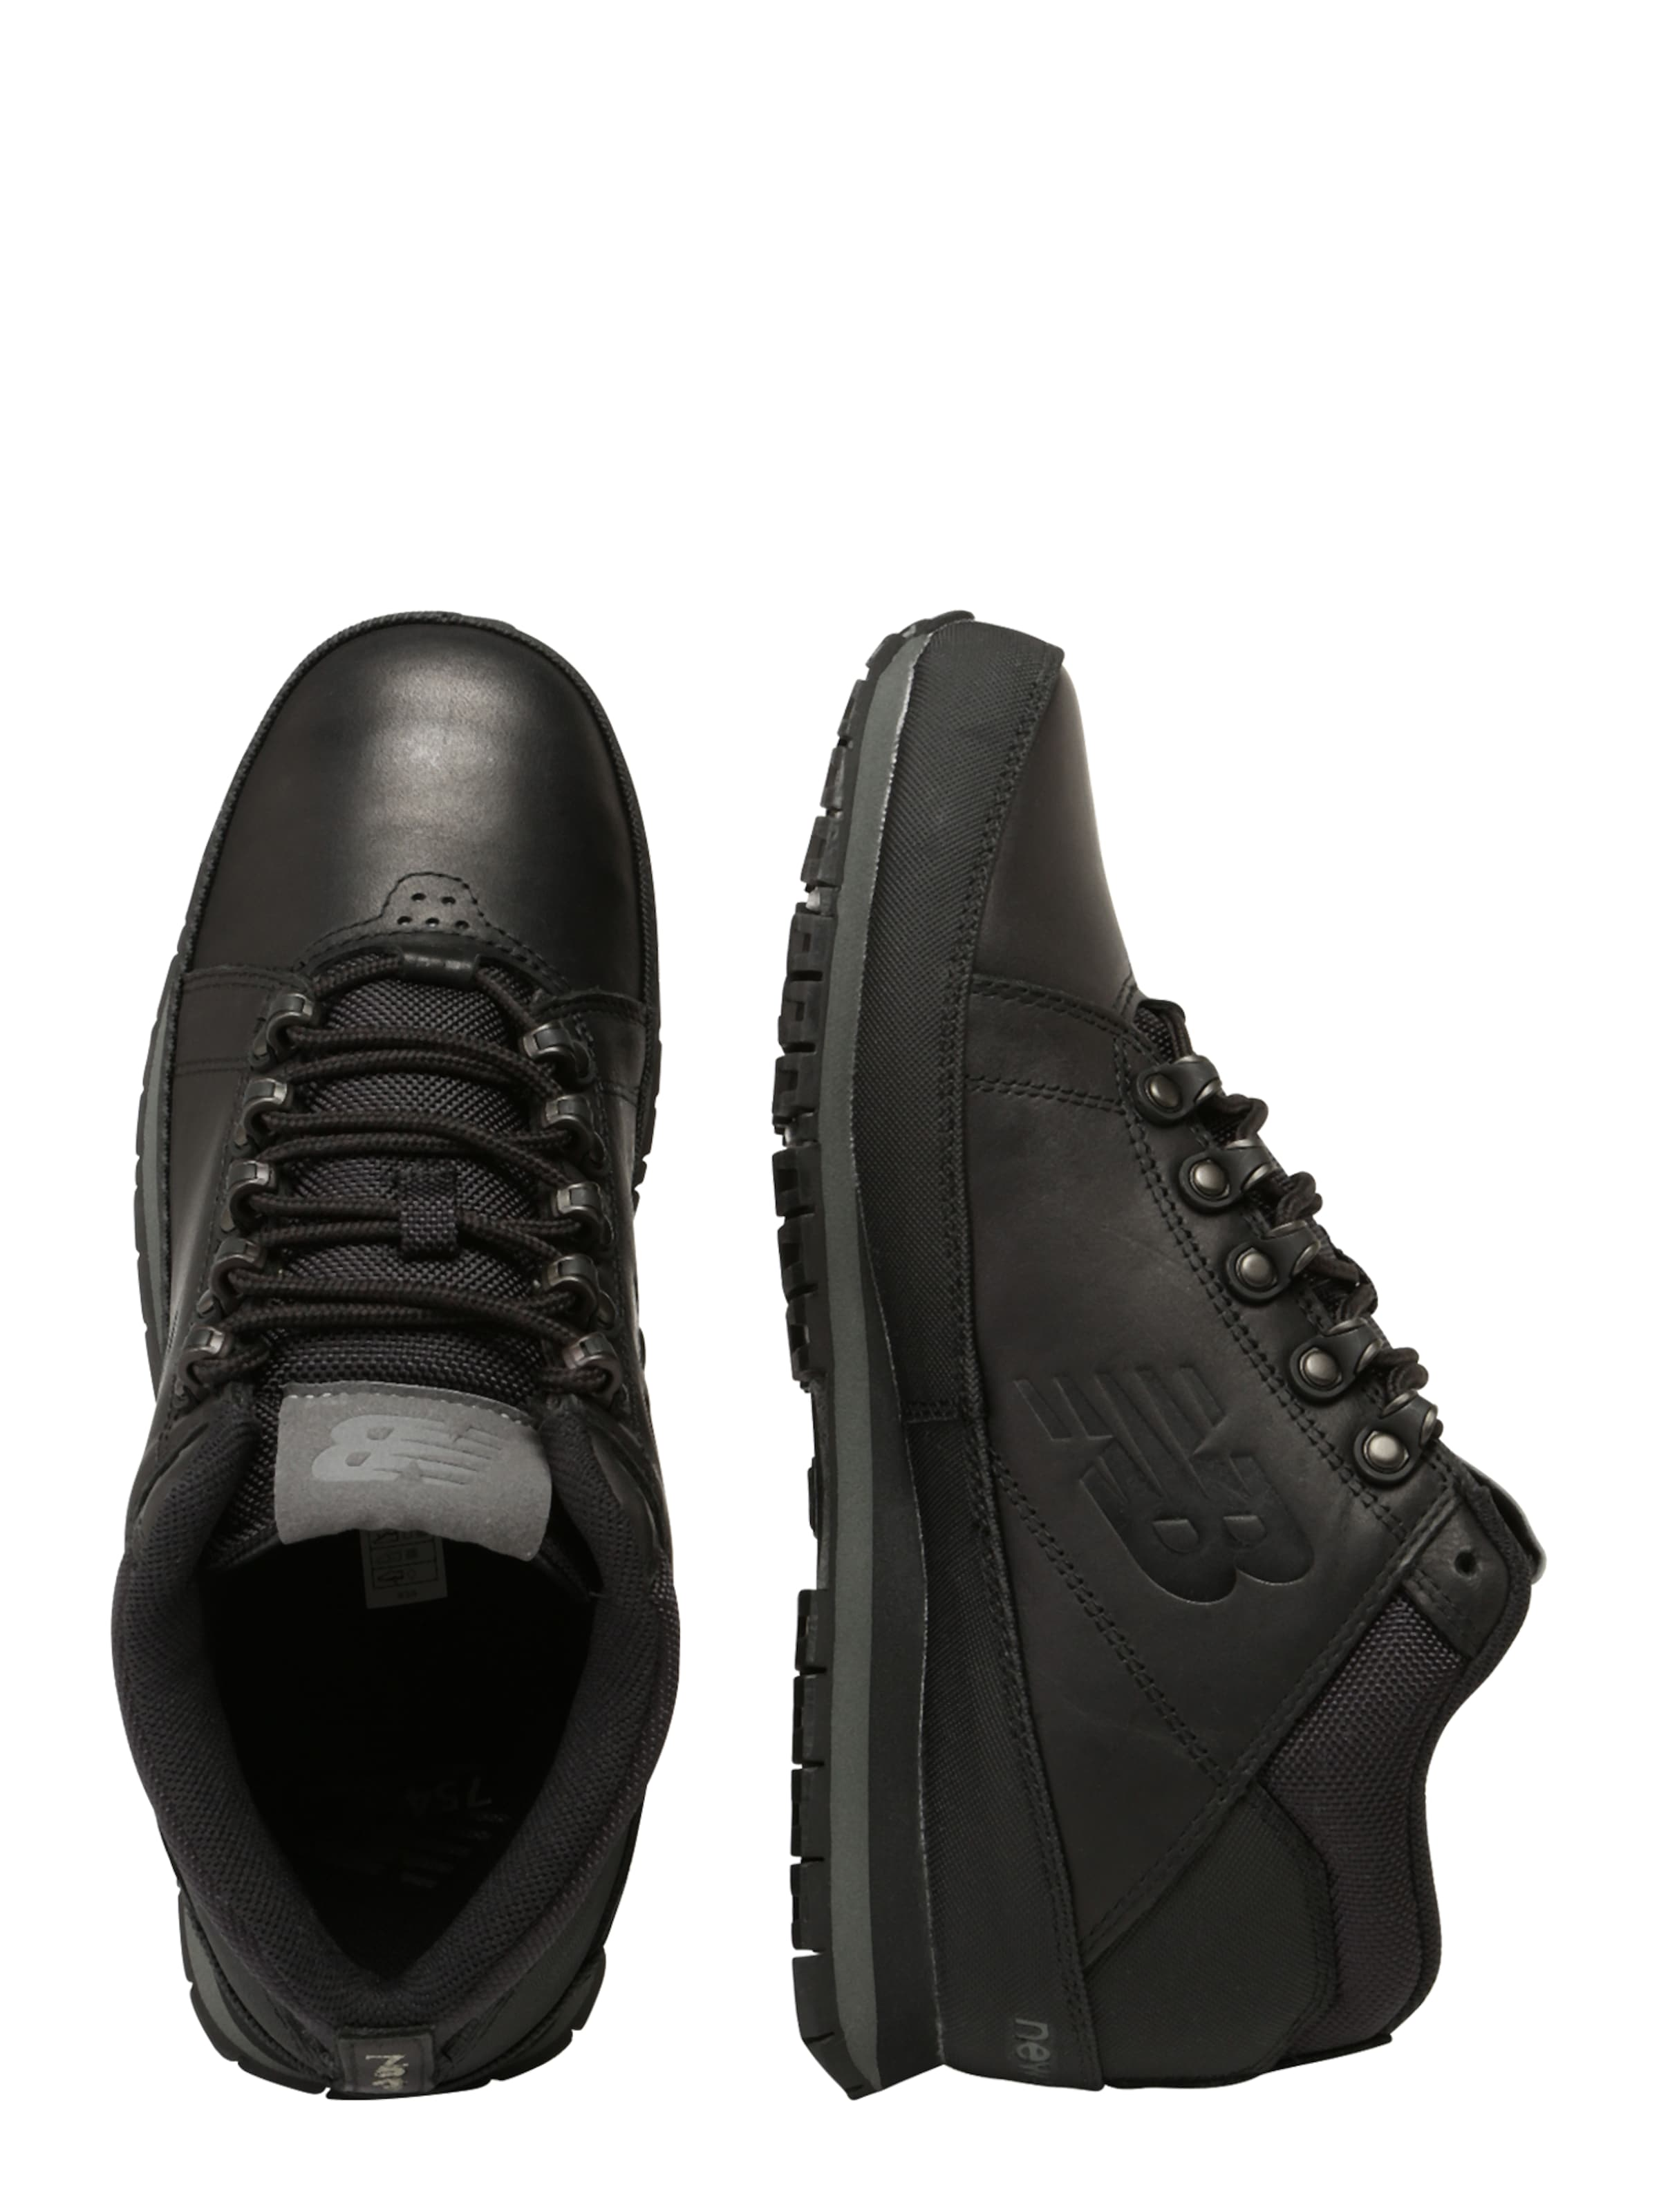 New Balance Sneaker Schwarz In g7vIYbf6y